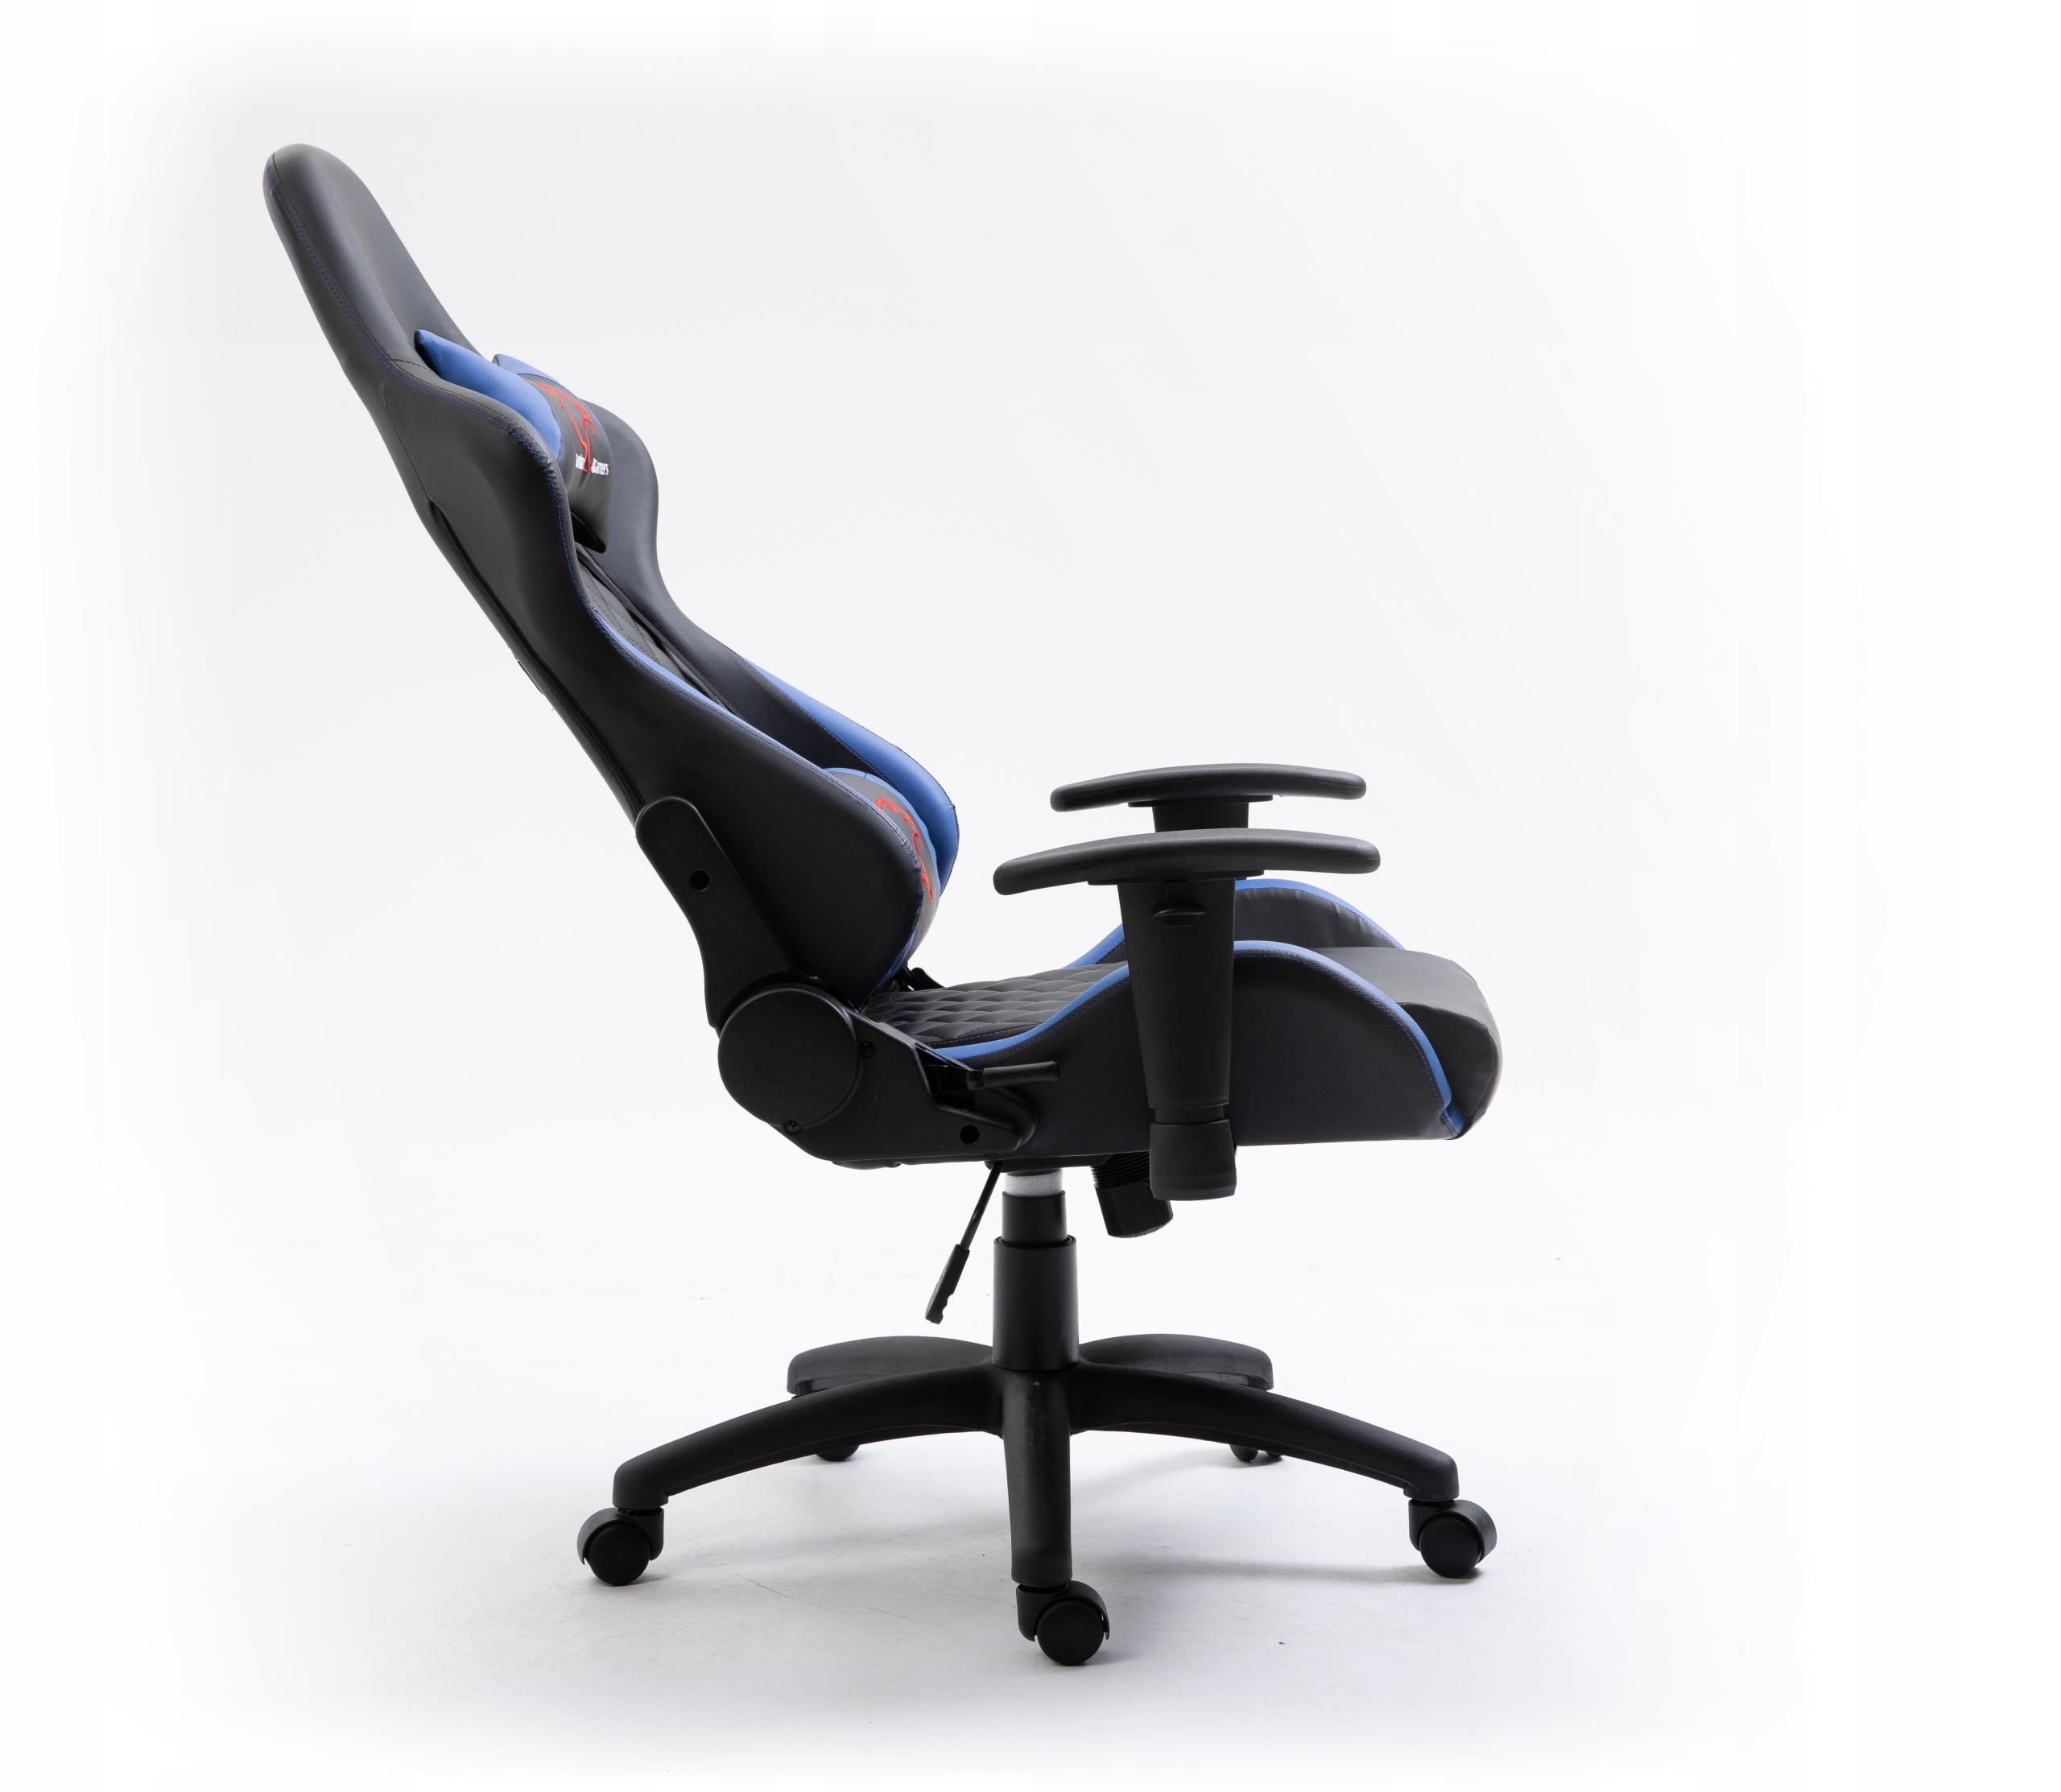 КРЕСЛО ИГРОВОЙ ПОВОРОТ F4G FG40 HQ СИНИЙ Ширина мебели 68 см.